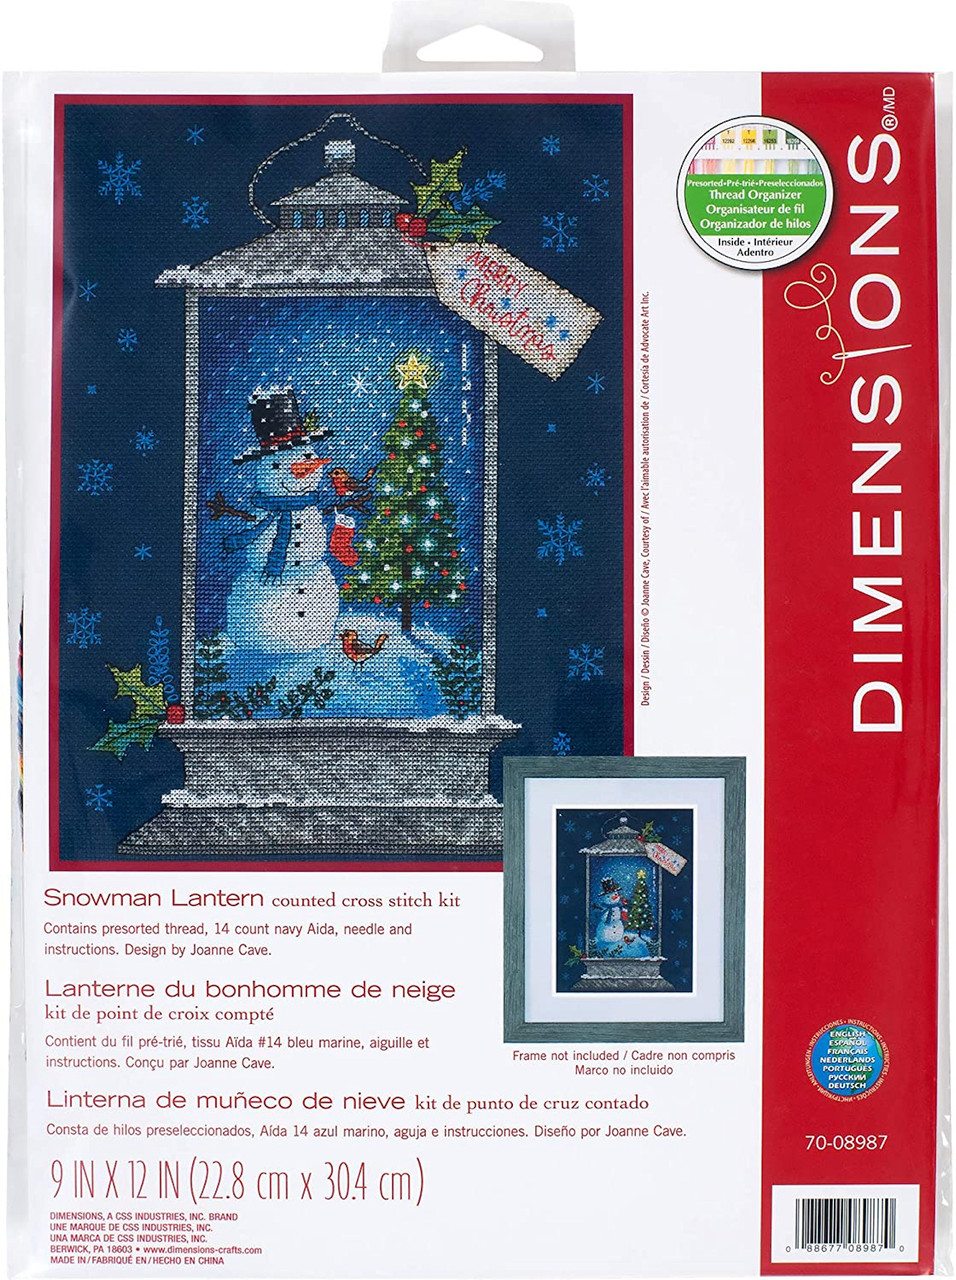 Dimensions - Snowman Lantern